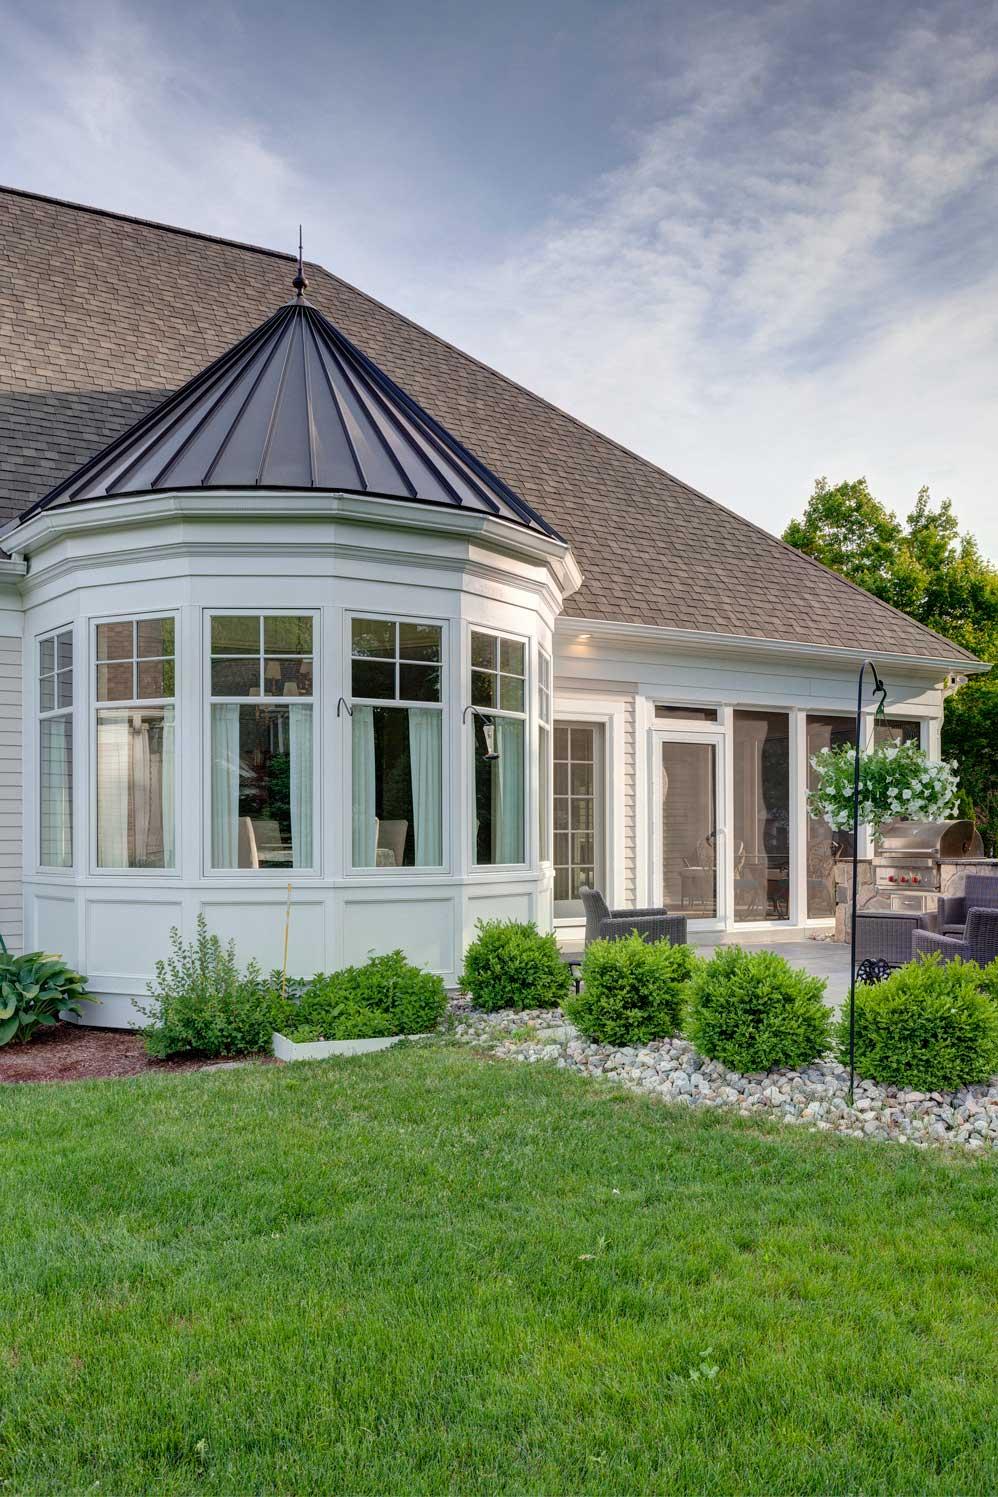 backyard view of home with circular room